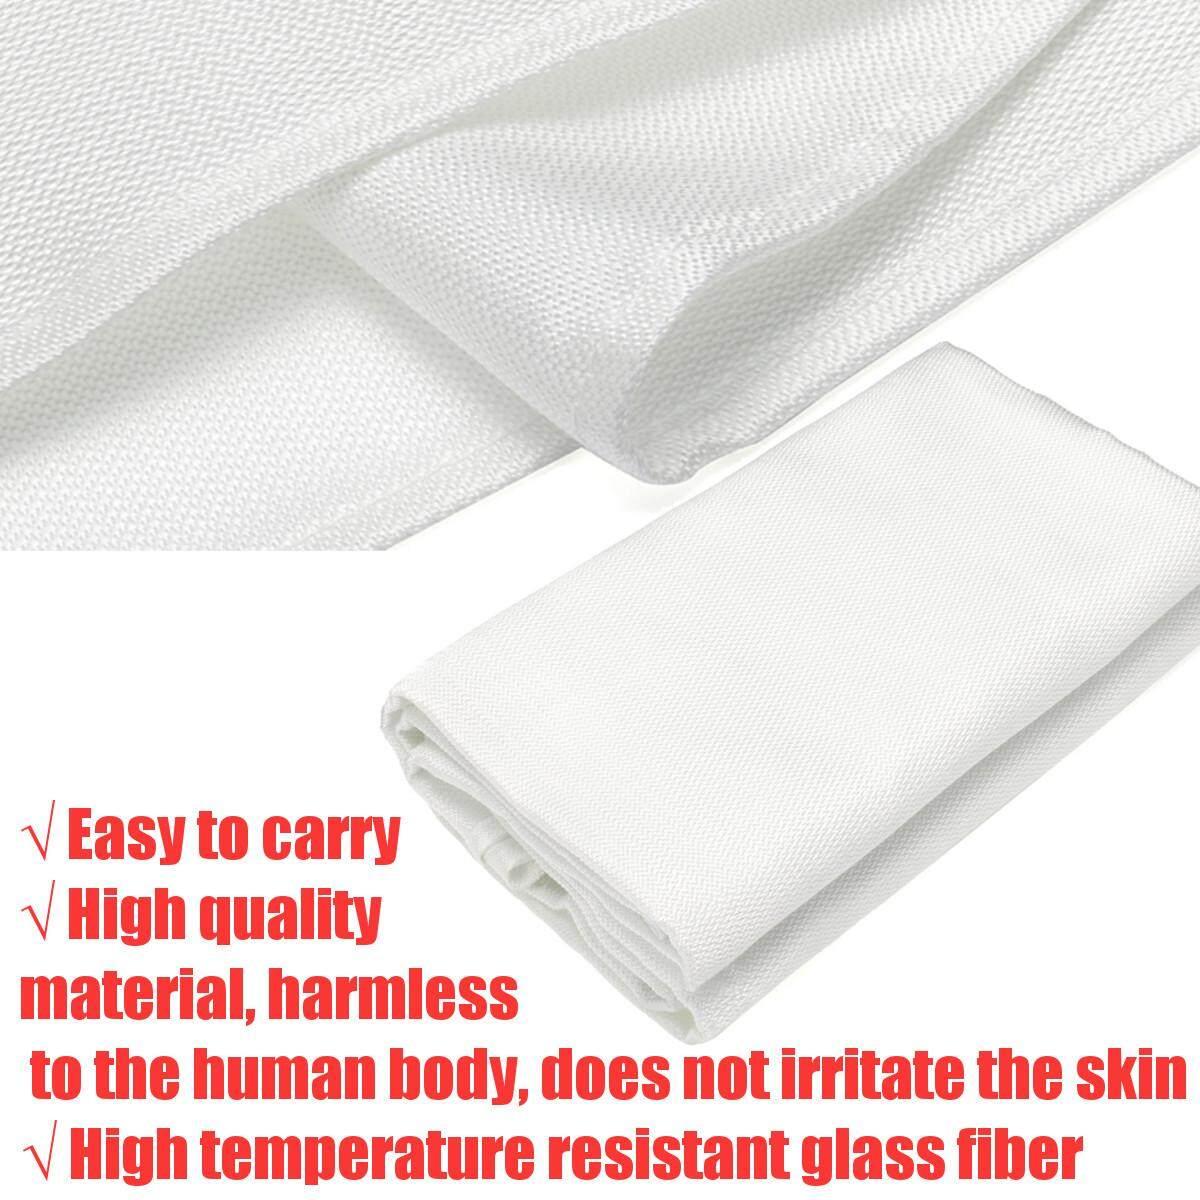 Welding Blanket 4 x 6 Flame Retardant Fiberglass Safety Shield Grommets - intl